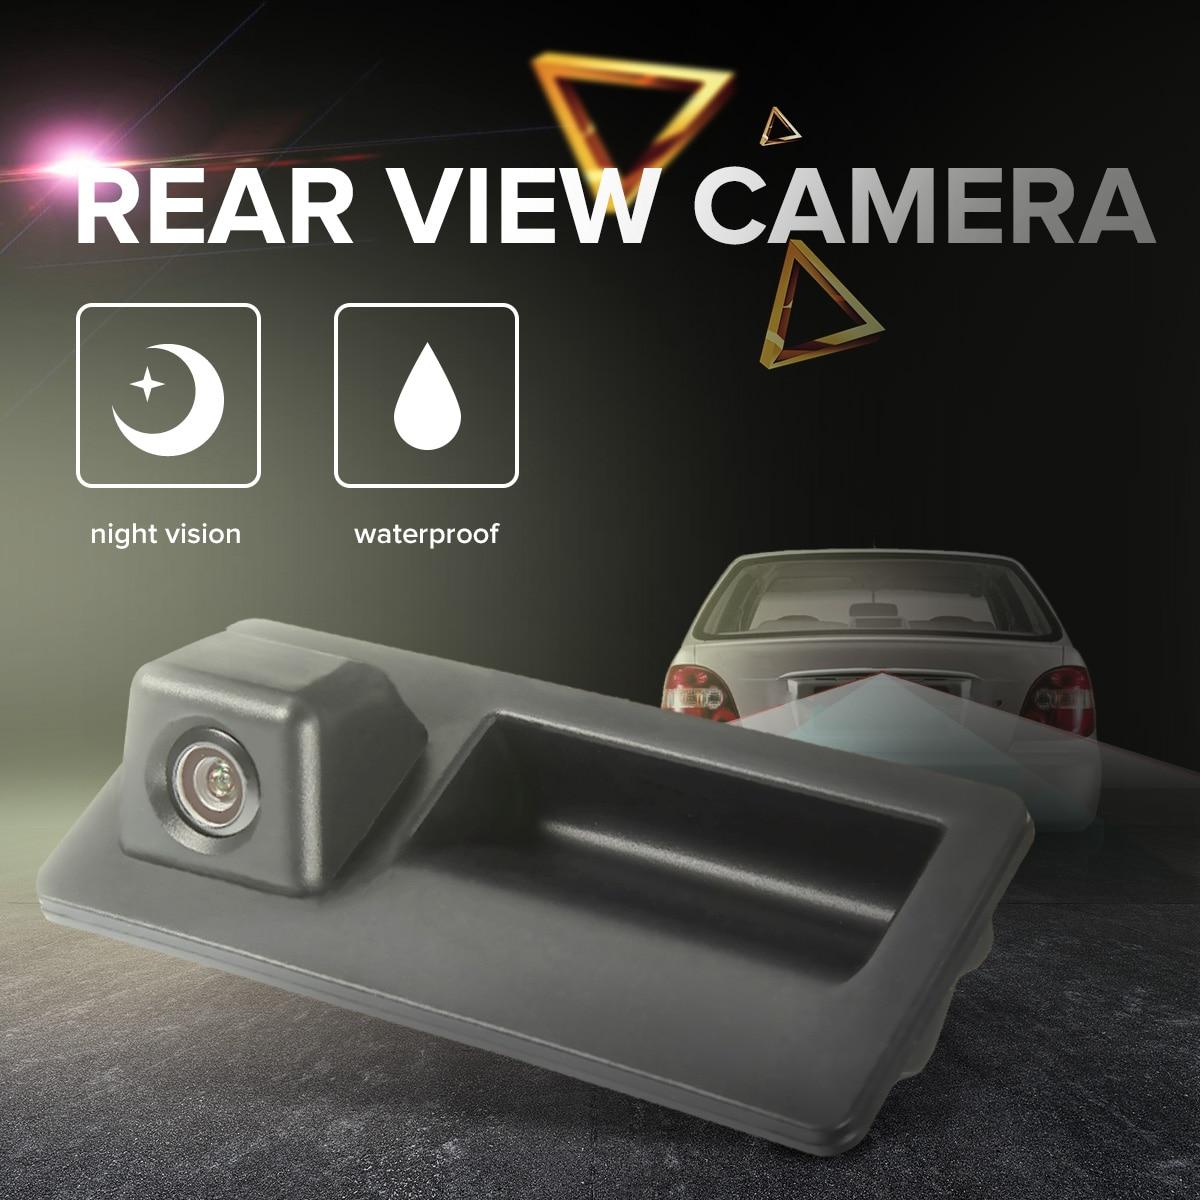 Heißer Auto Rückansicht Kameras Rückfahr Reverse Kamera Für VW/JETTA/TIGUAN/RCD510/RNS315/RNS310 /RNS510